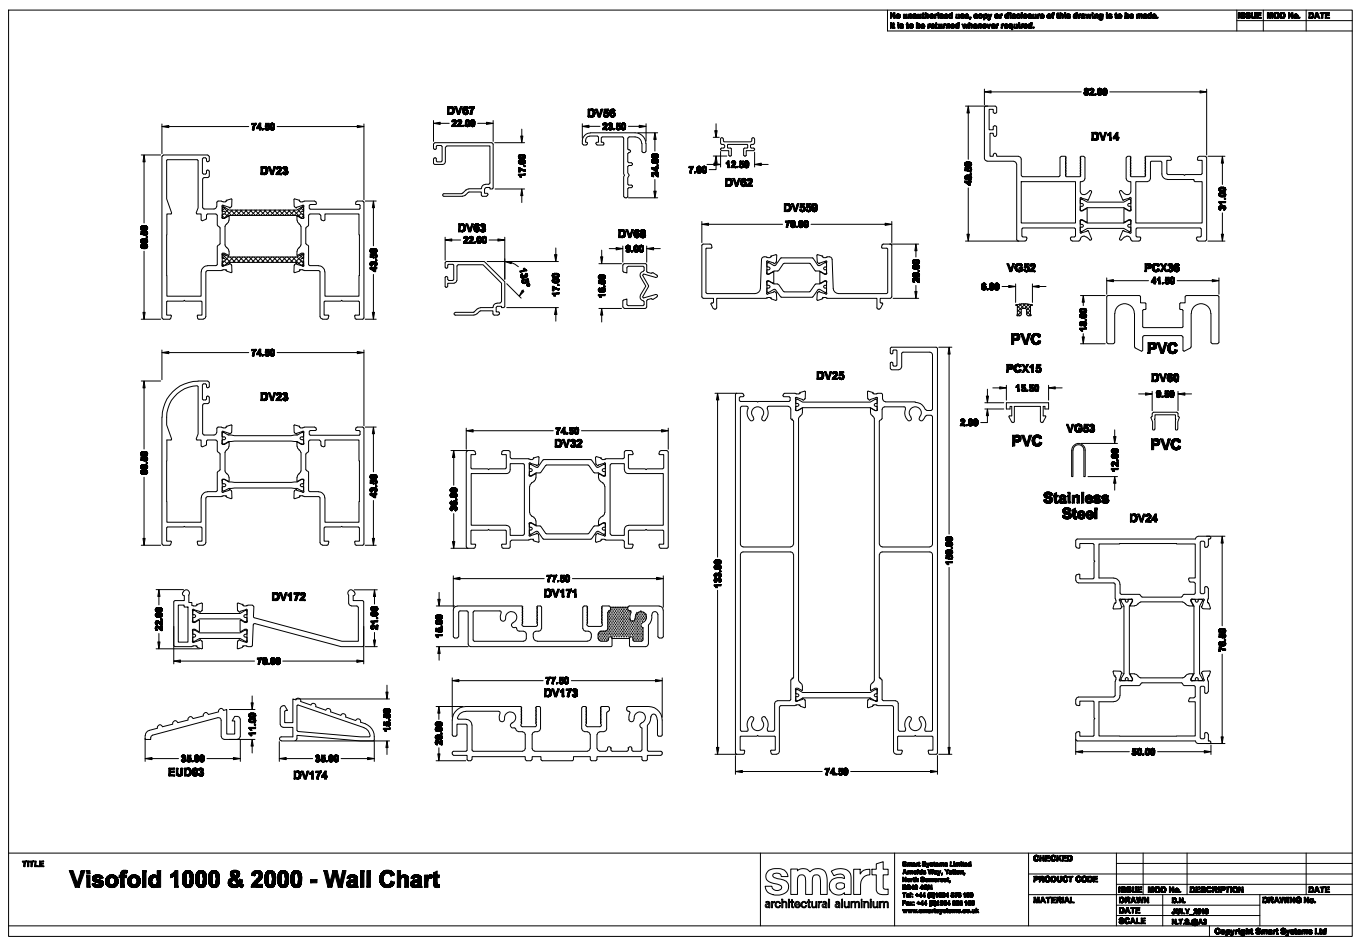 Ali bi-fold wall chart image